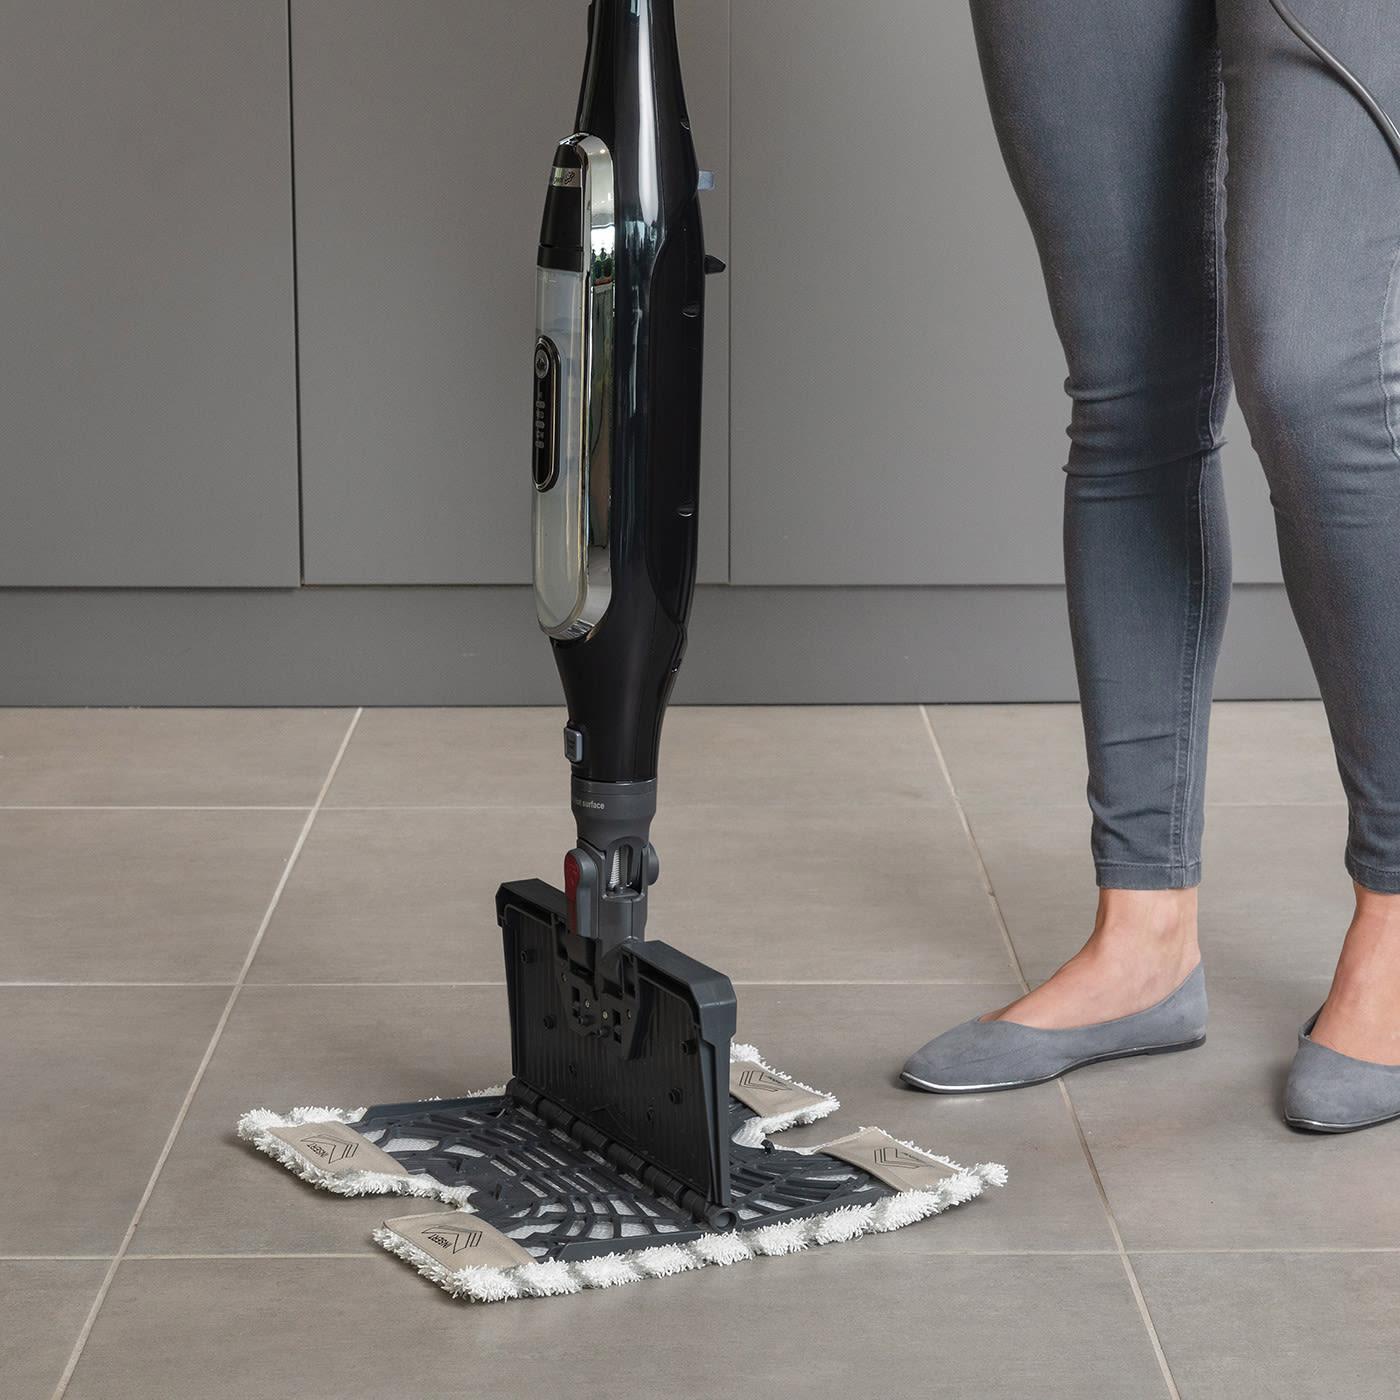 Klik n' Flip Automatic Steam Mop